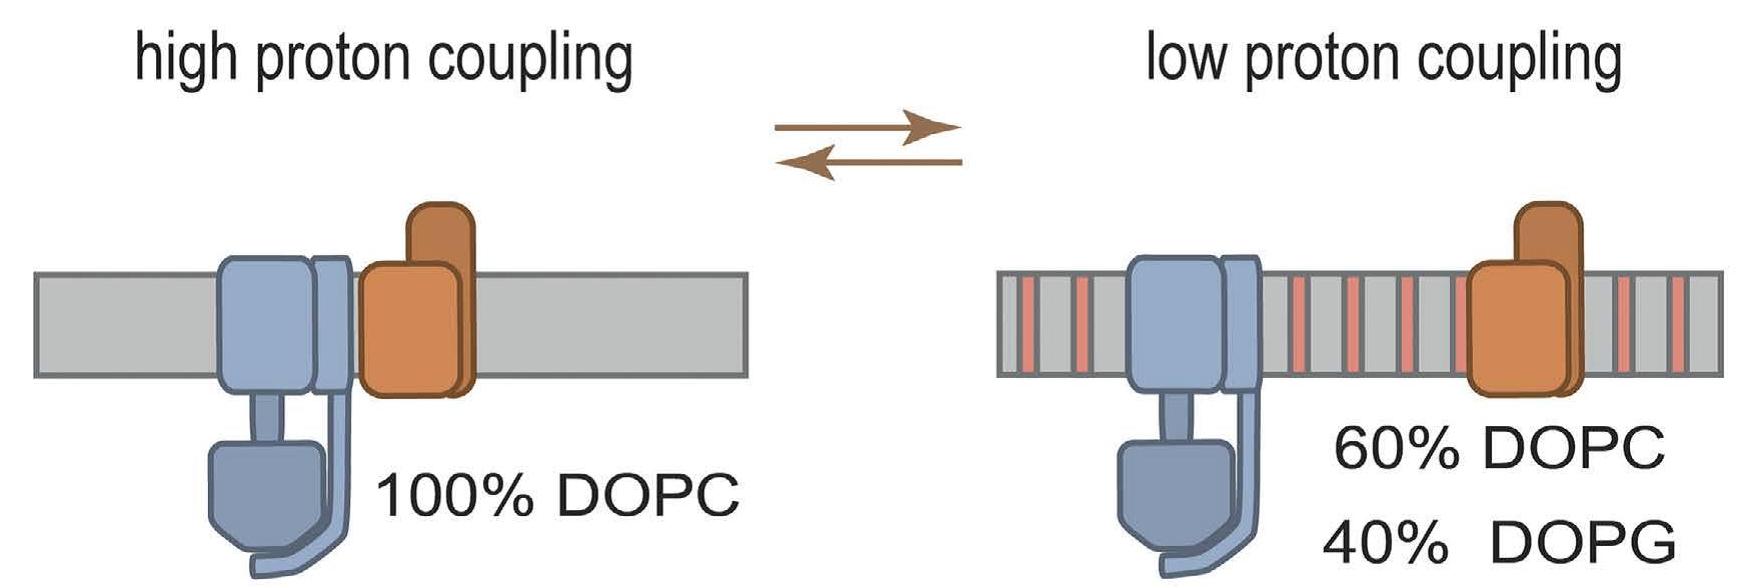 Proton coupling scheme